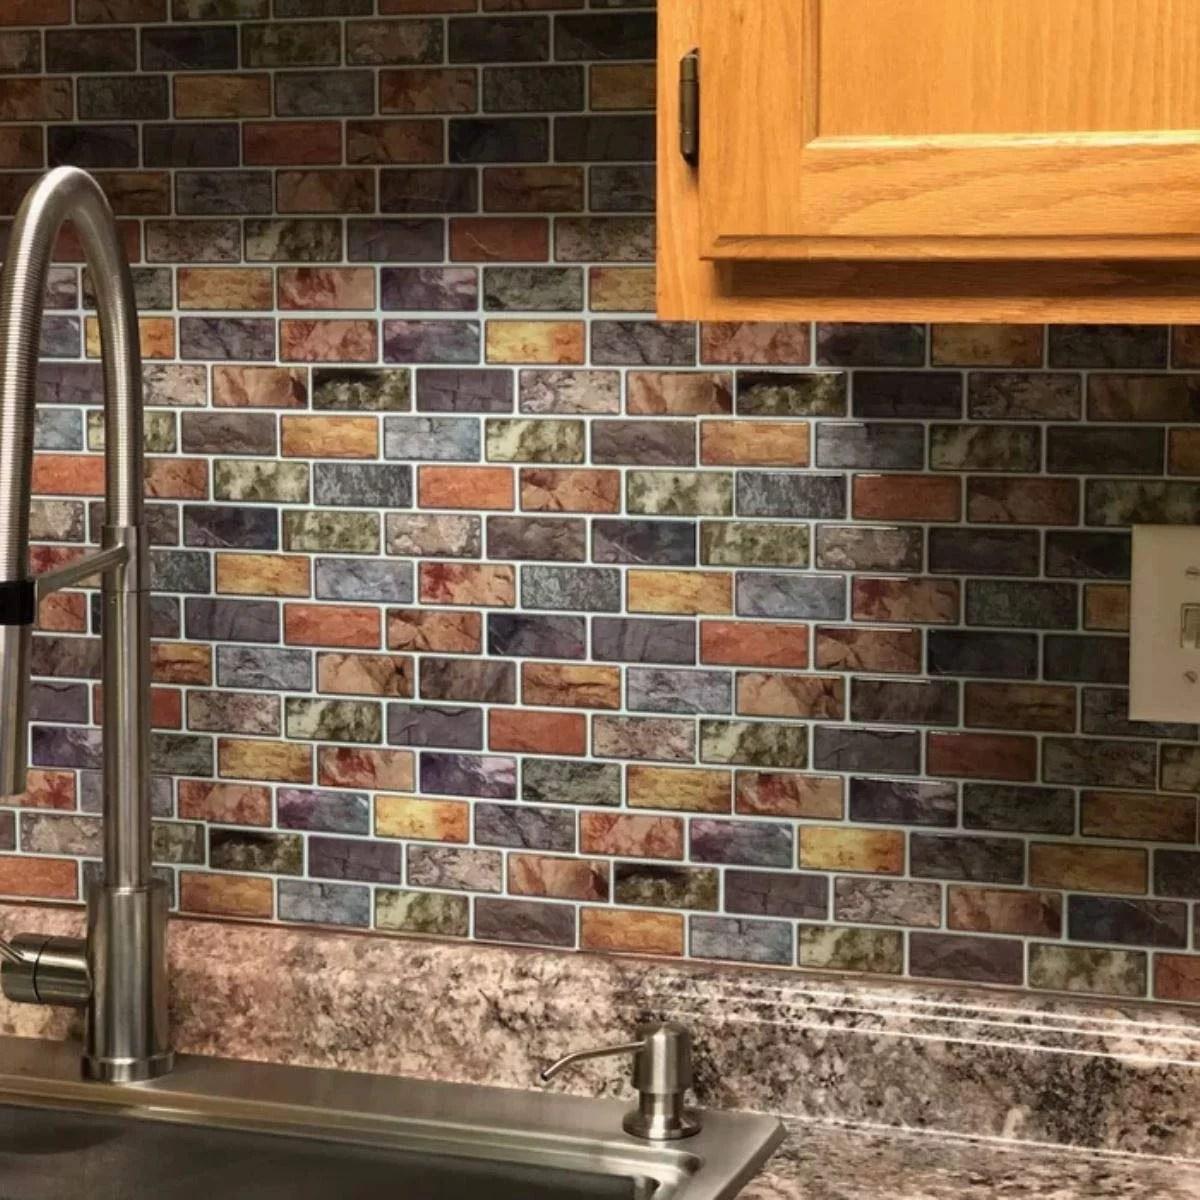 art3d 10 sheet peel stick kitchen backsplash sticker 12 x 12 faux ceramic tile design walmart com